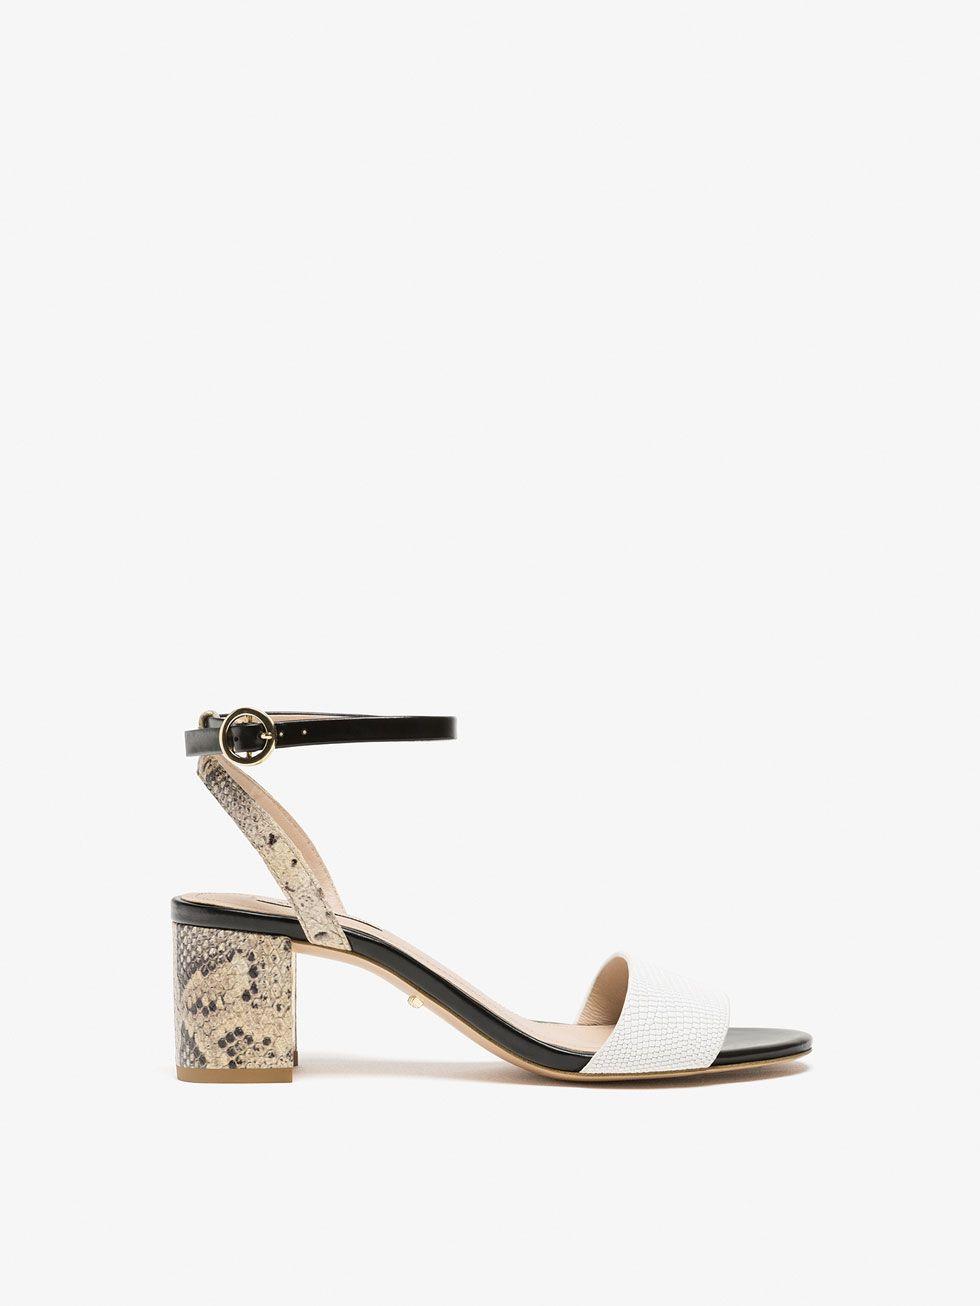 Massimo 2016 At Dutti Contrast Women´s Autumn Strappy Winter Sandals g7Ybyf6v